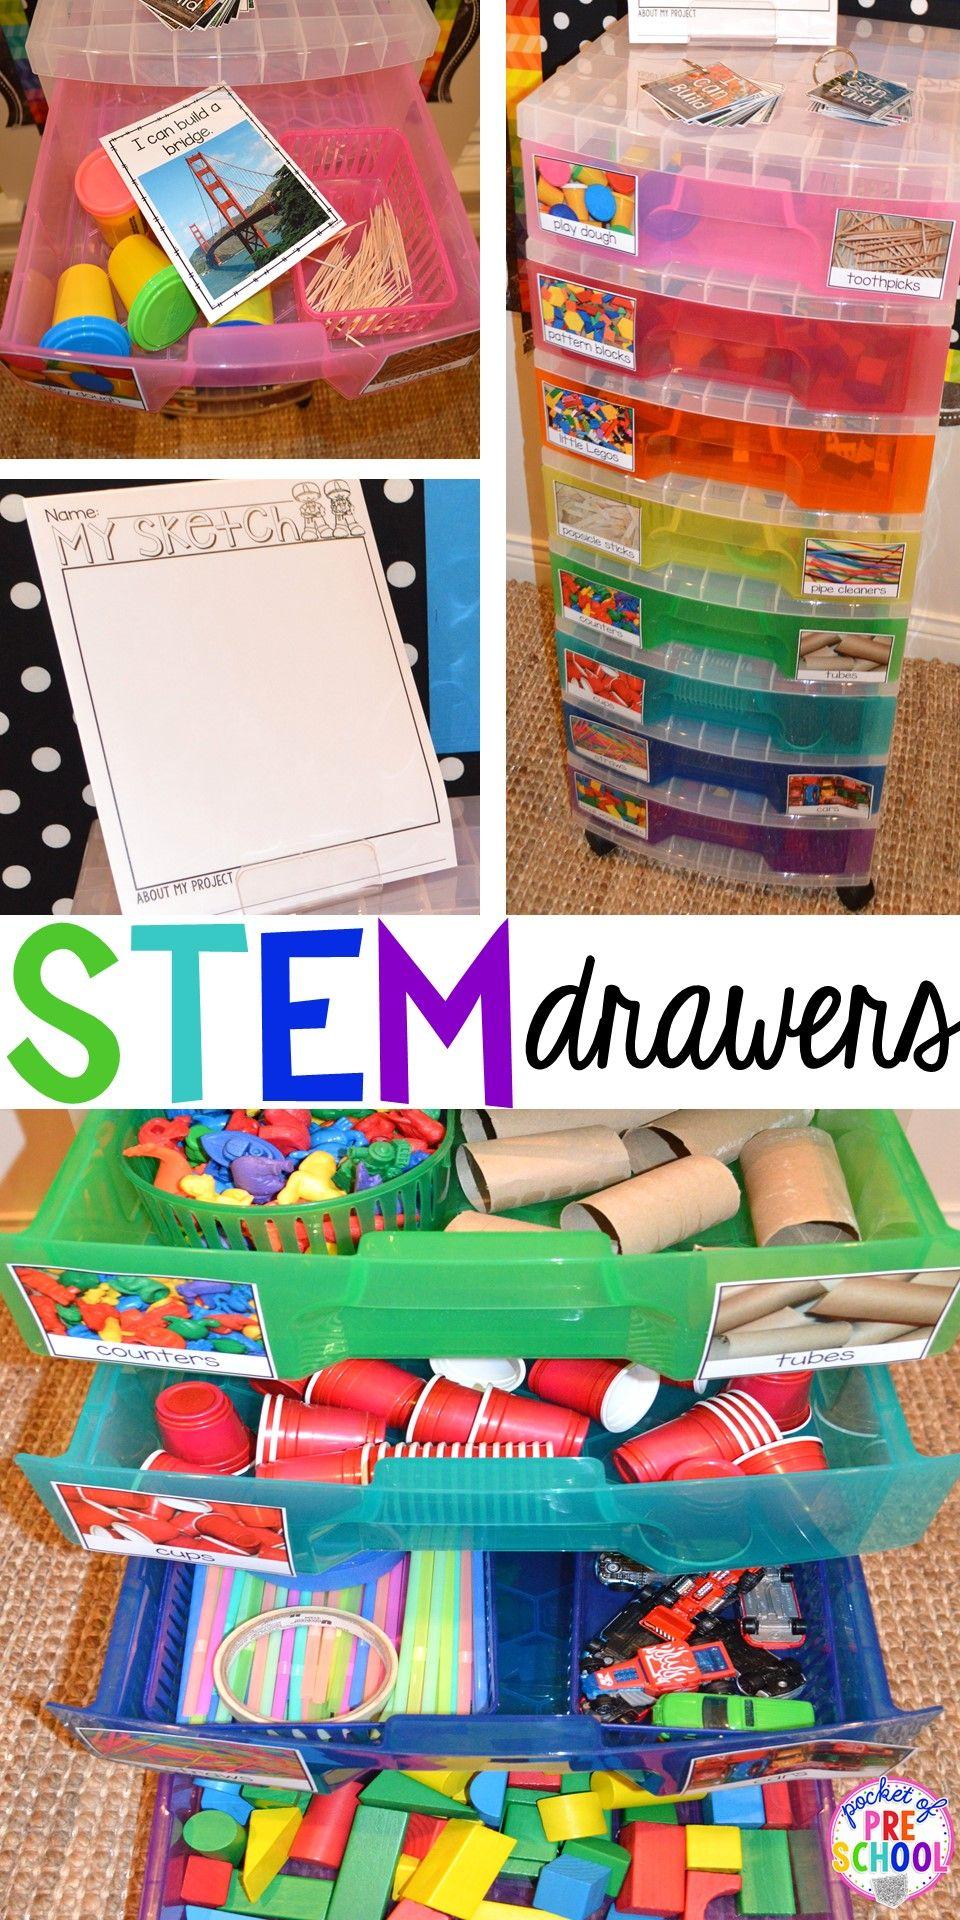 Stem I Can Build And Stem Drawers Blog Pocket Of Preschool